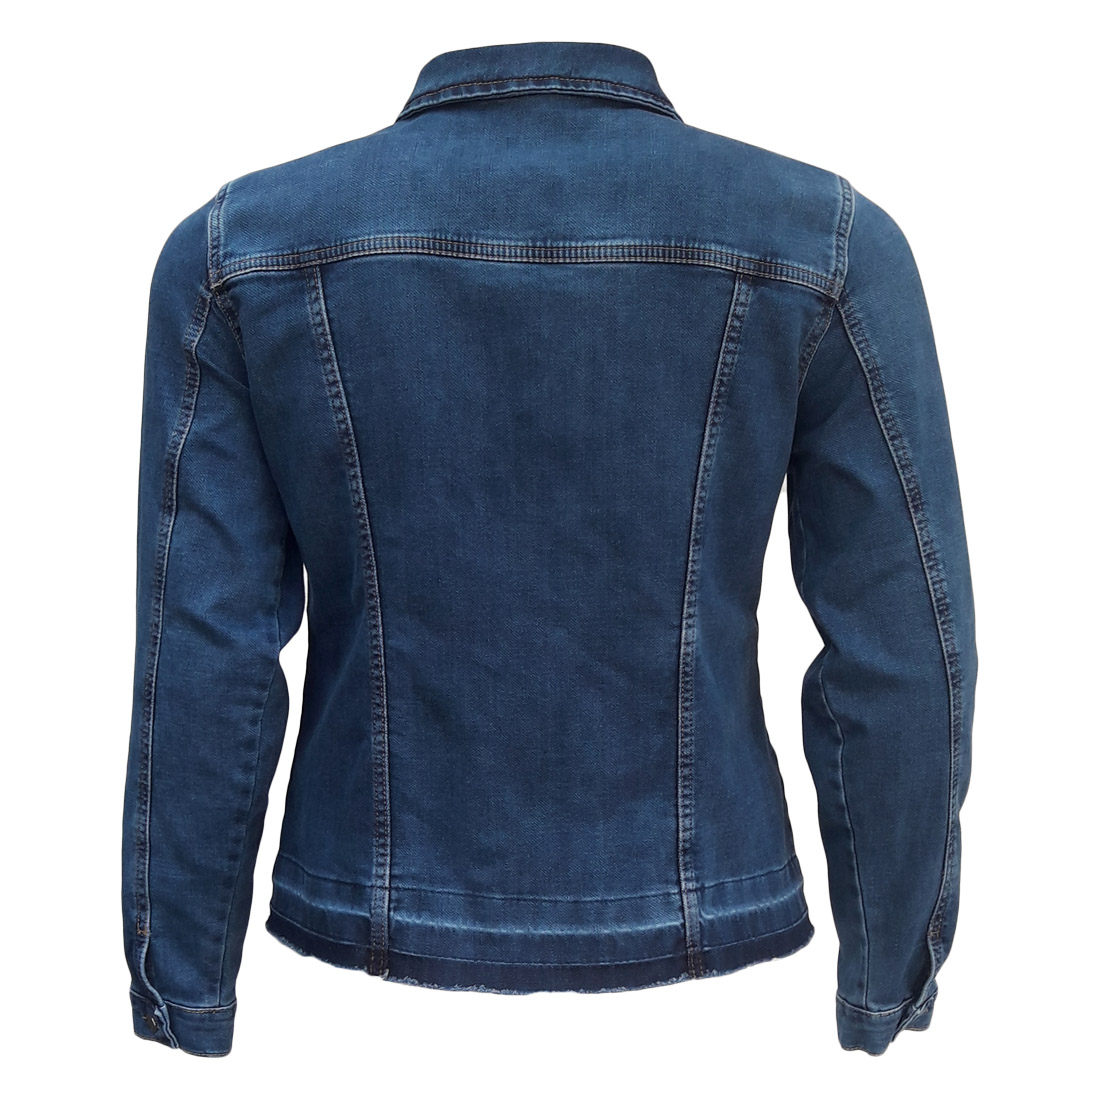 Jaqueta Jeans Feminina Barra Desmanchada Plus Size